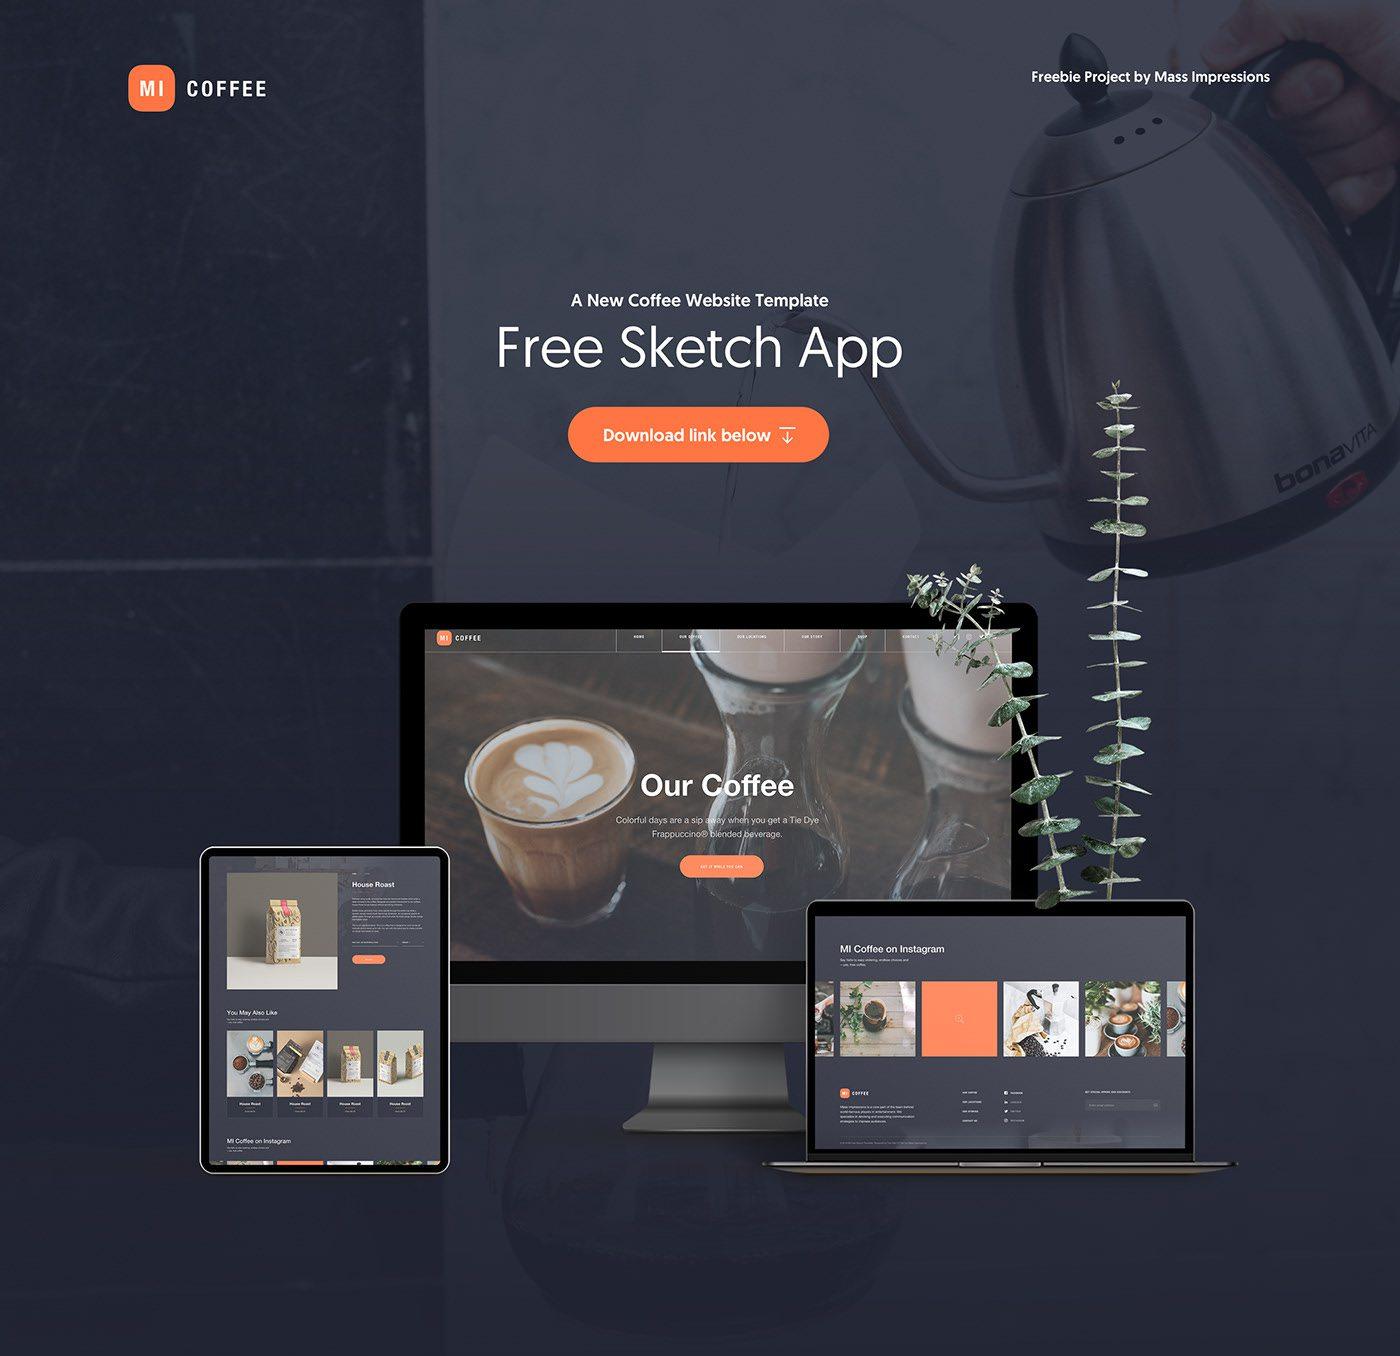 MI Cafe - Free Sketch App Template